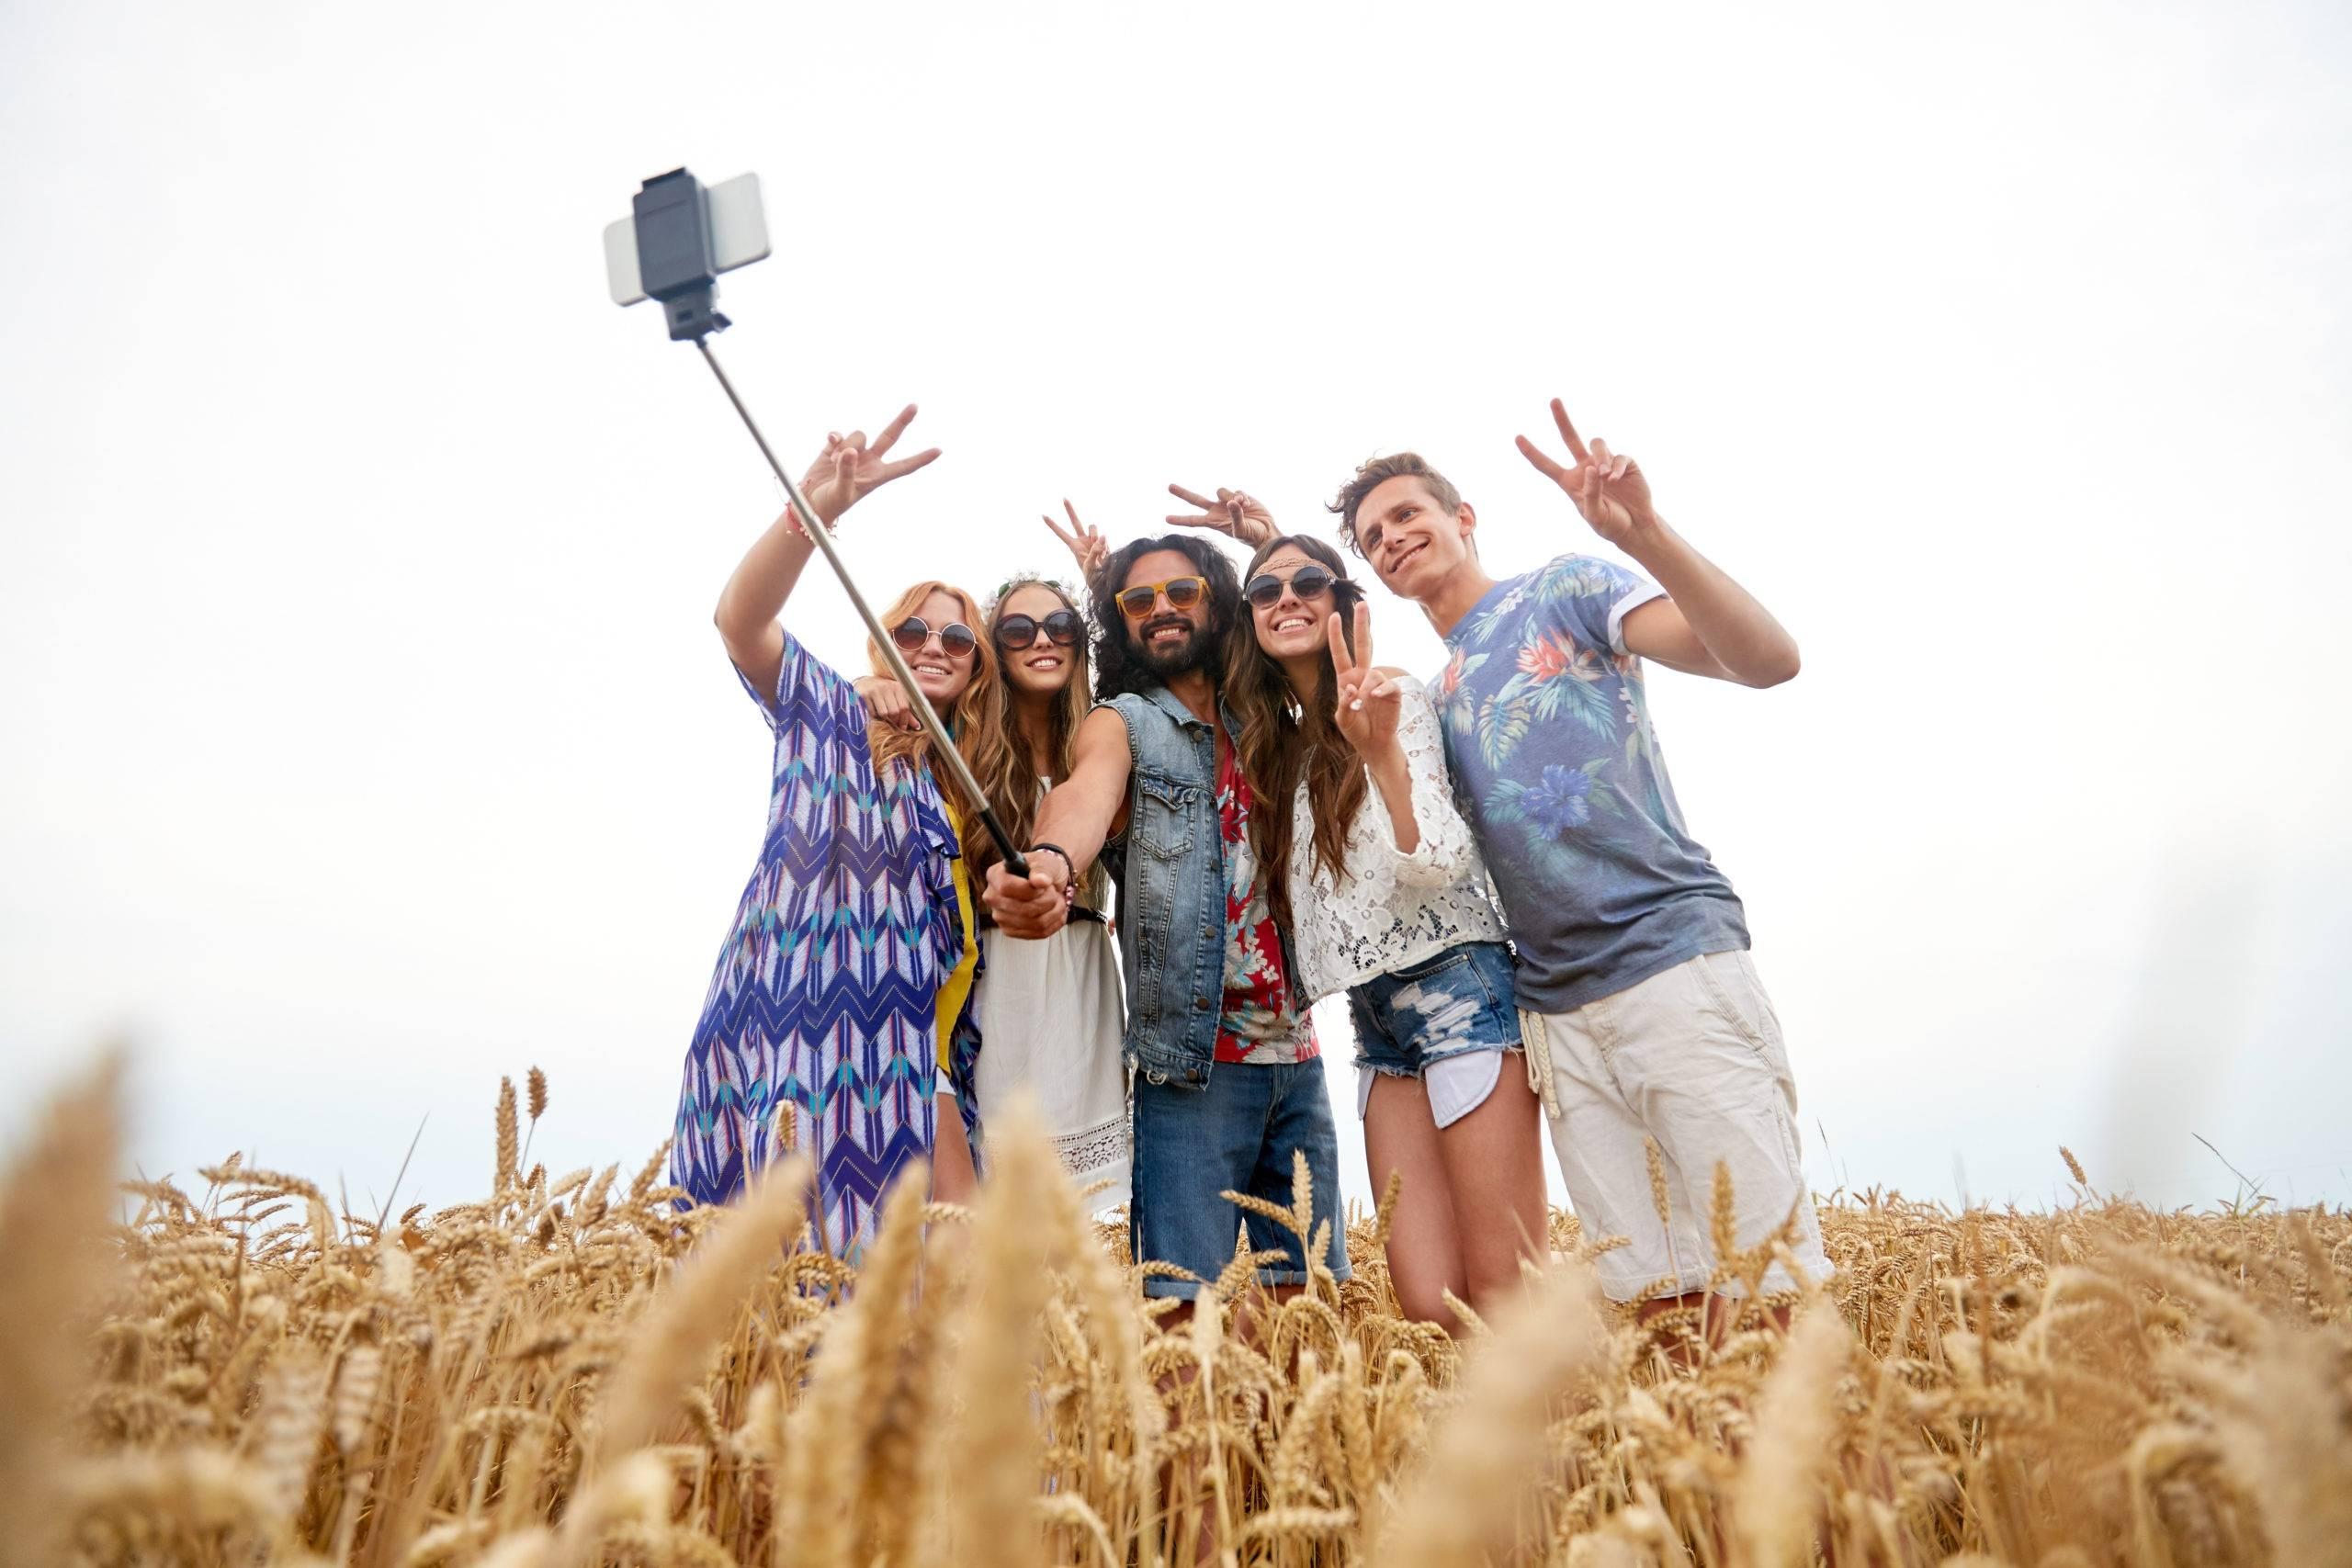 Best Selfie Sticks to Buy in 2018